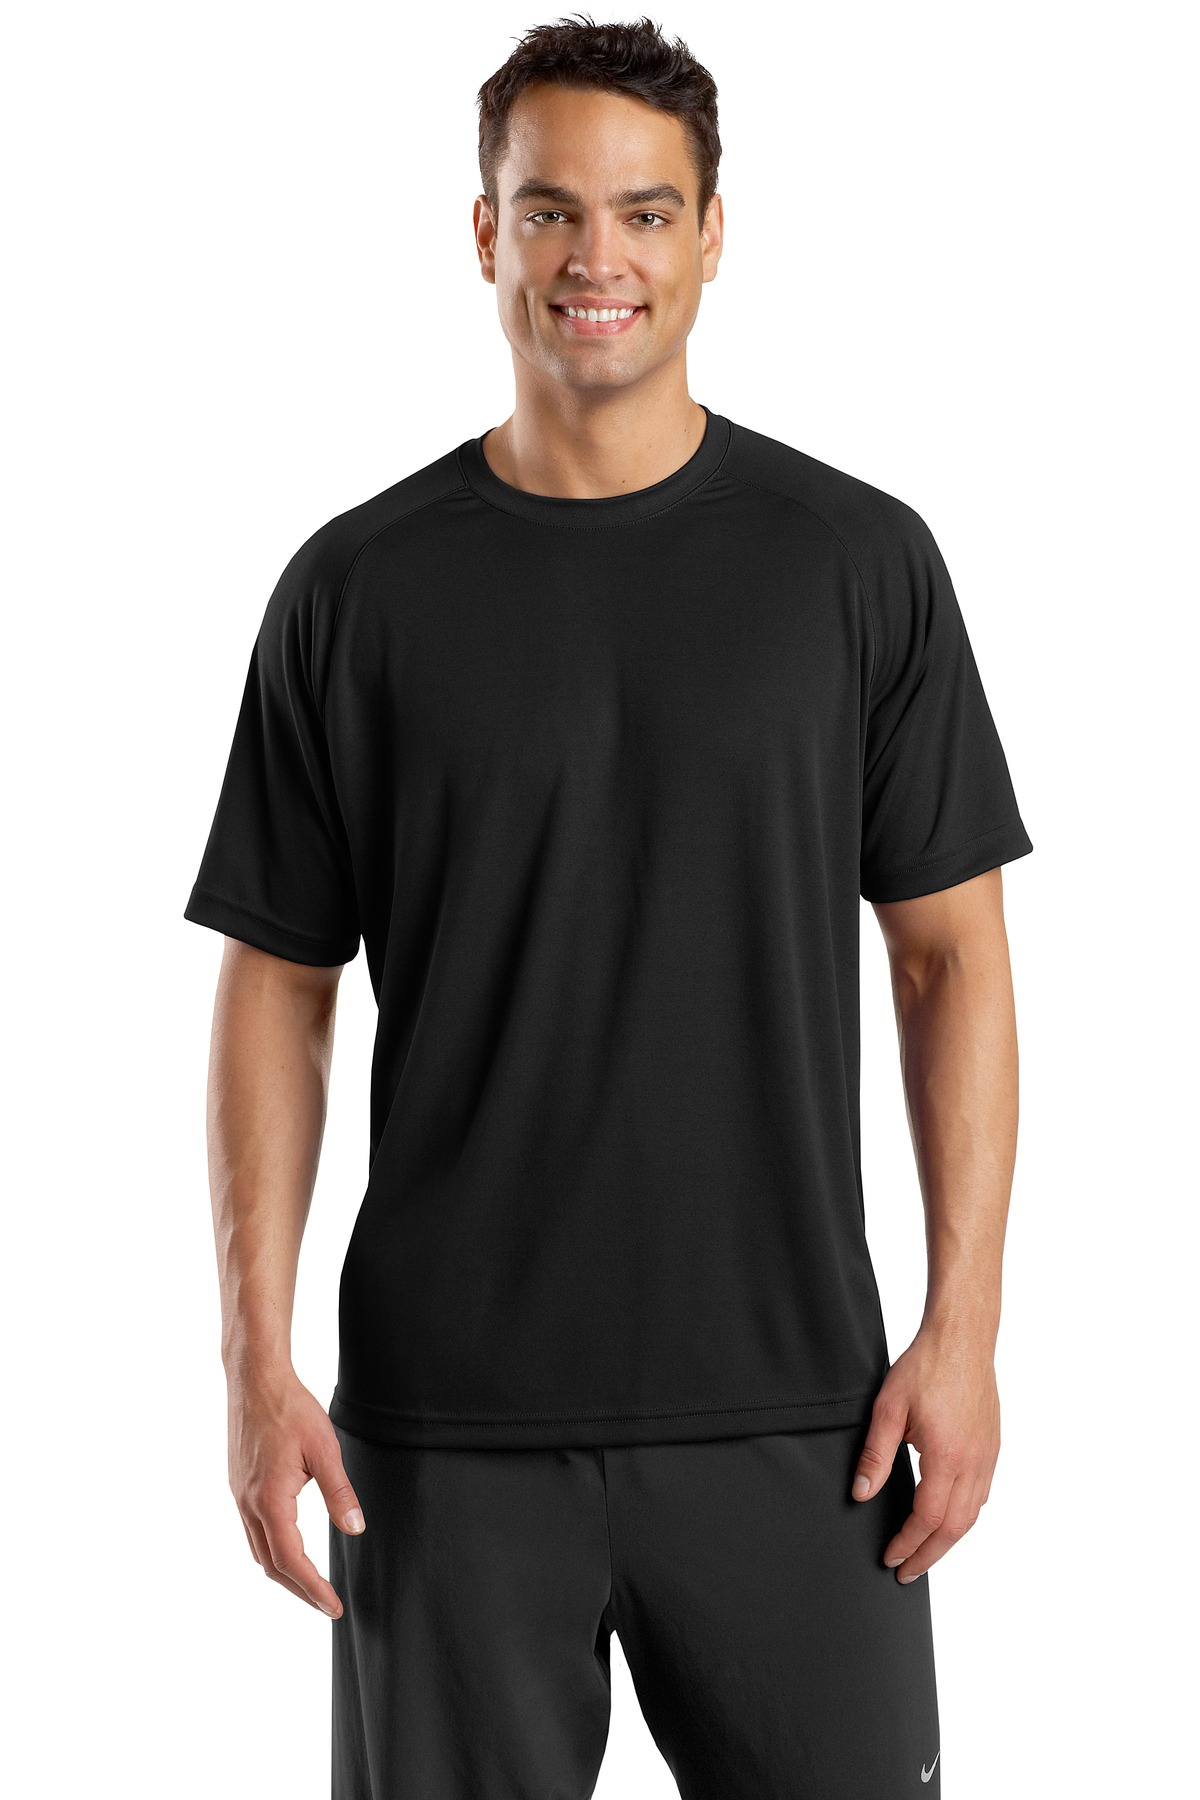 Black Shirt Model | Is Shirt